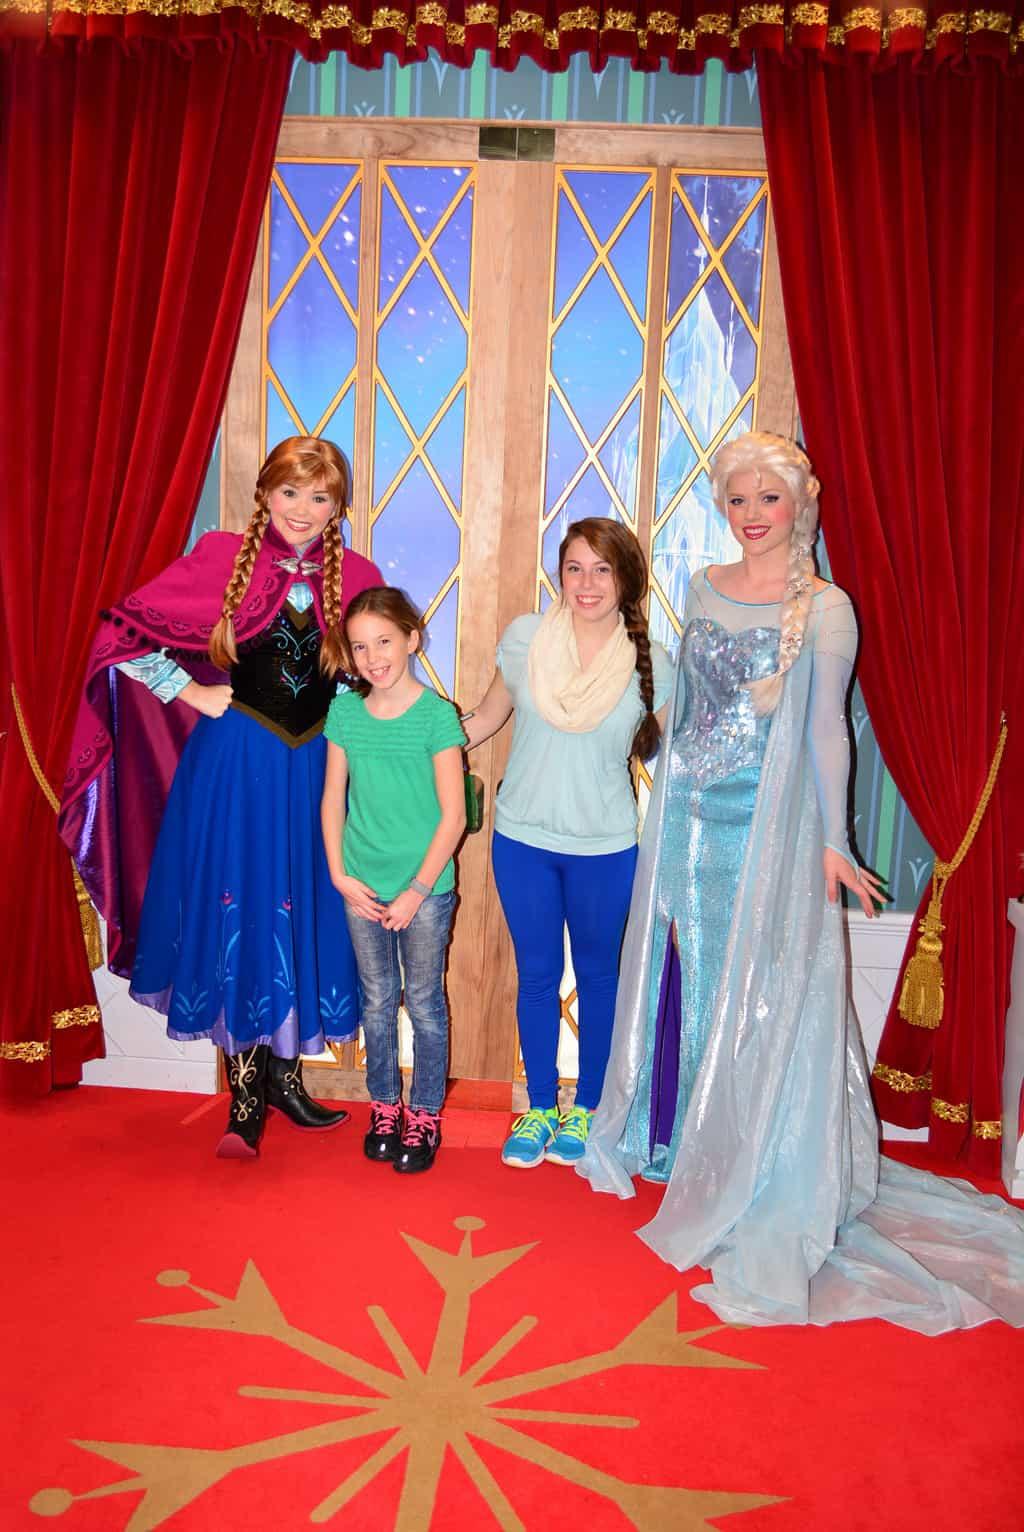 Walt Disney World, Epcot, rope drop